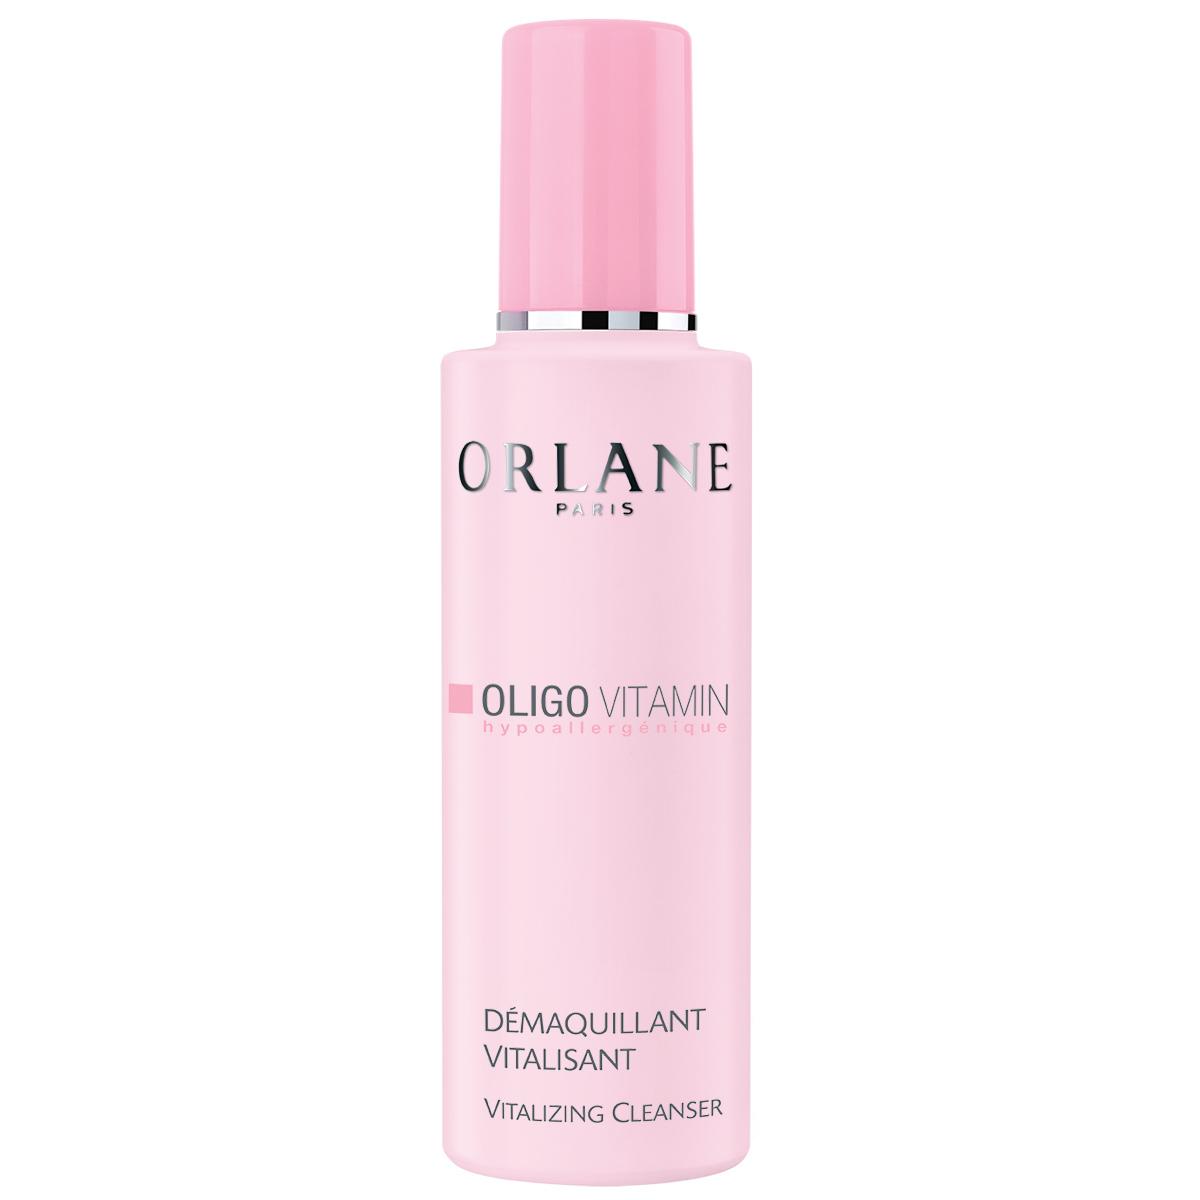 Orlane - Oligo Vitamin - Démaquillant Vitalisant 250 ml